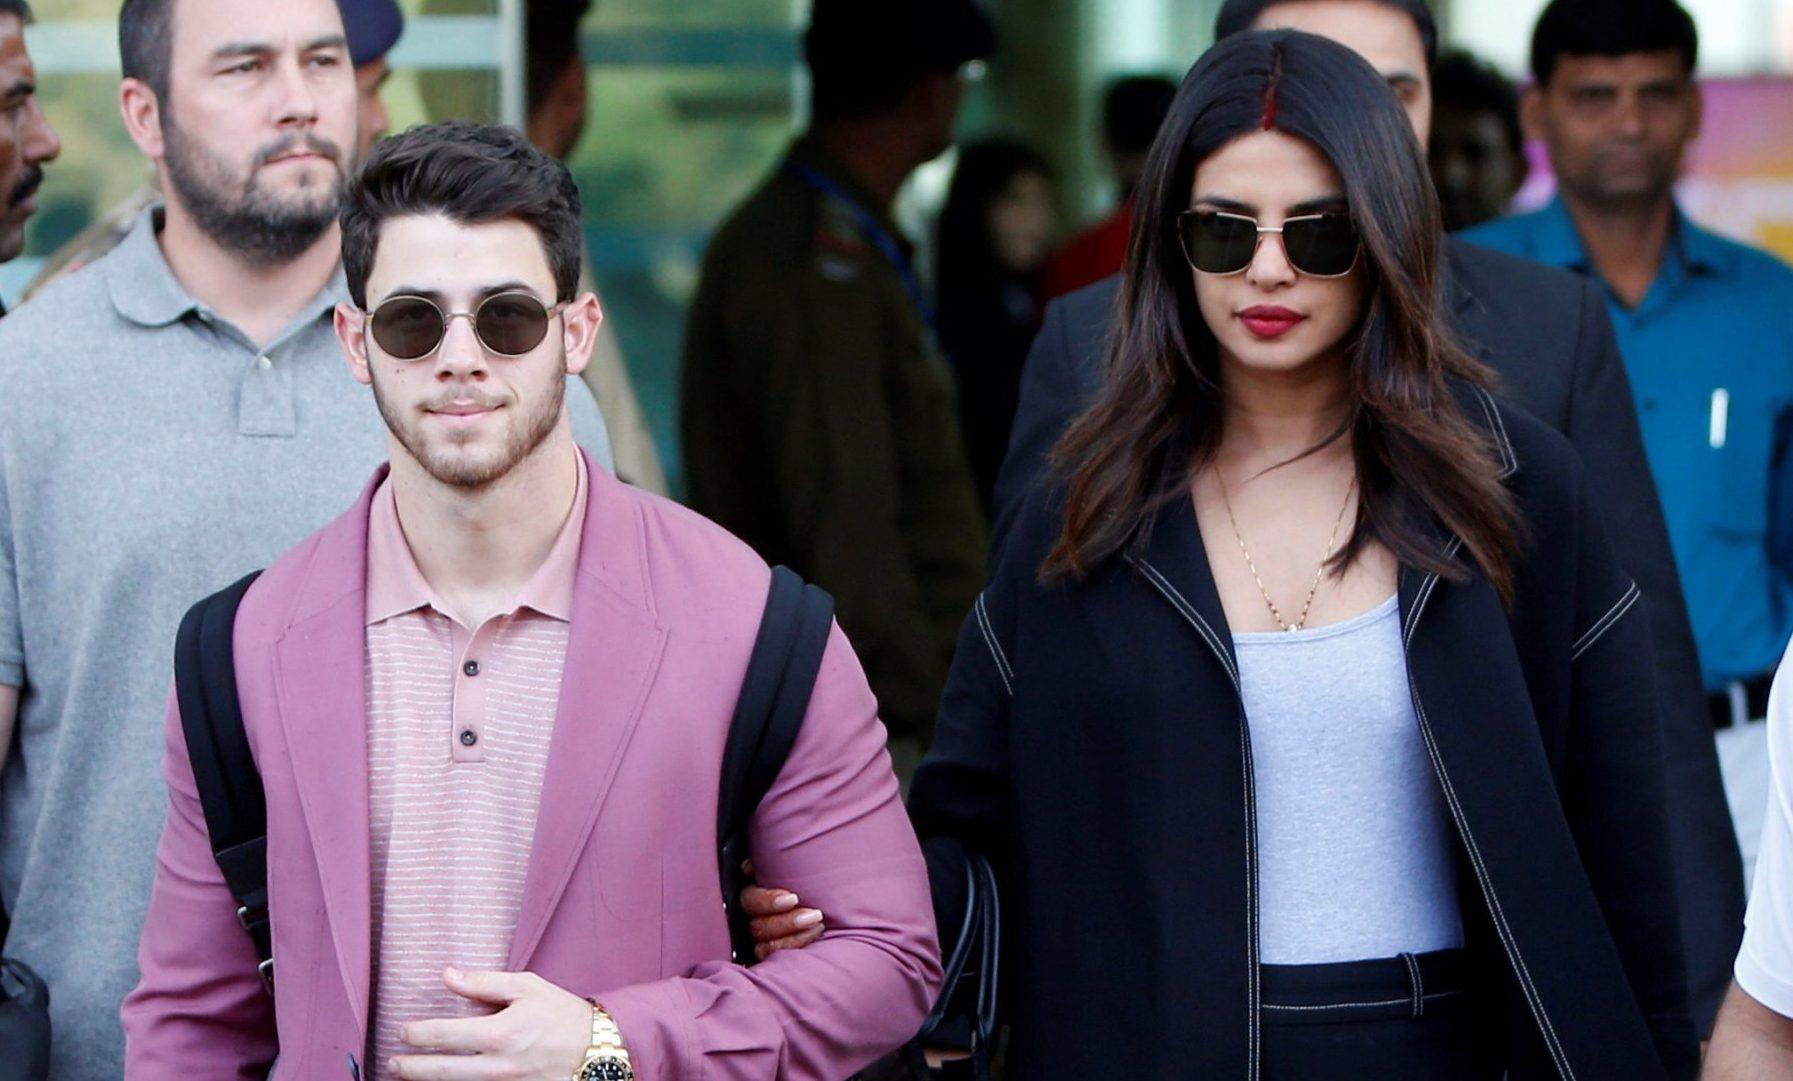 Joe Jonas gushes over brother Nick and Priyanka Chopra as newly weds continue tour of India